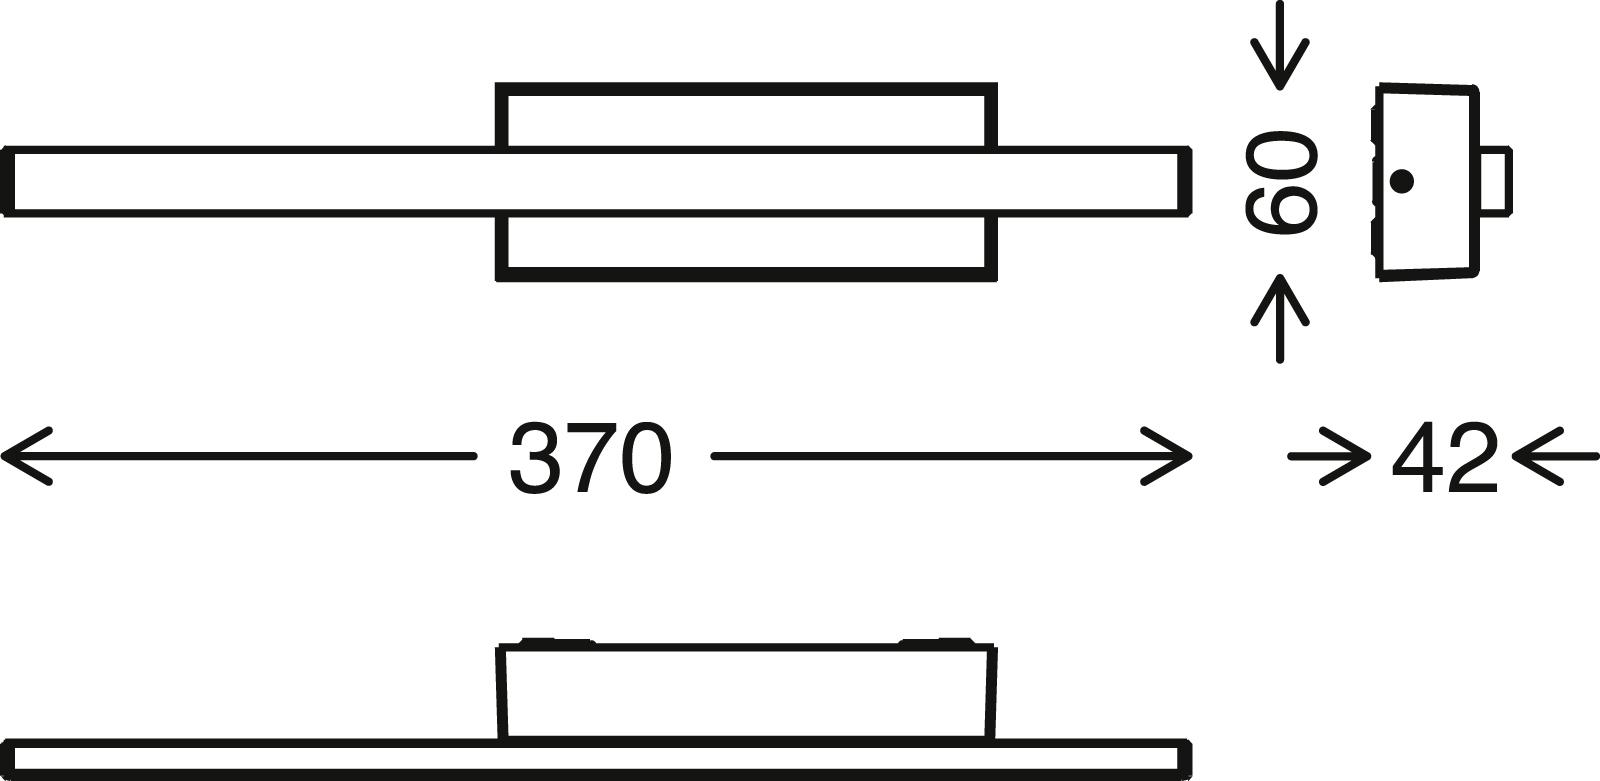 TELEFUNKEN LED Aussenwandleuchte, 37 cm, 4 W, Schwarz